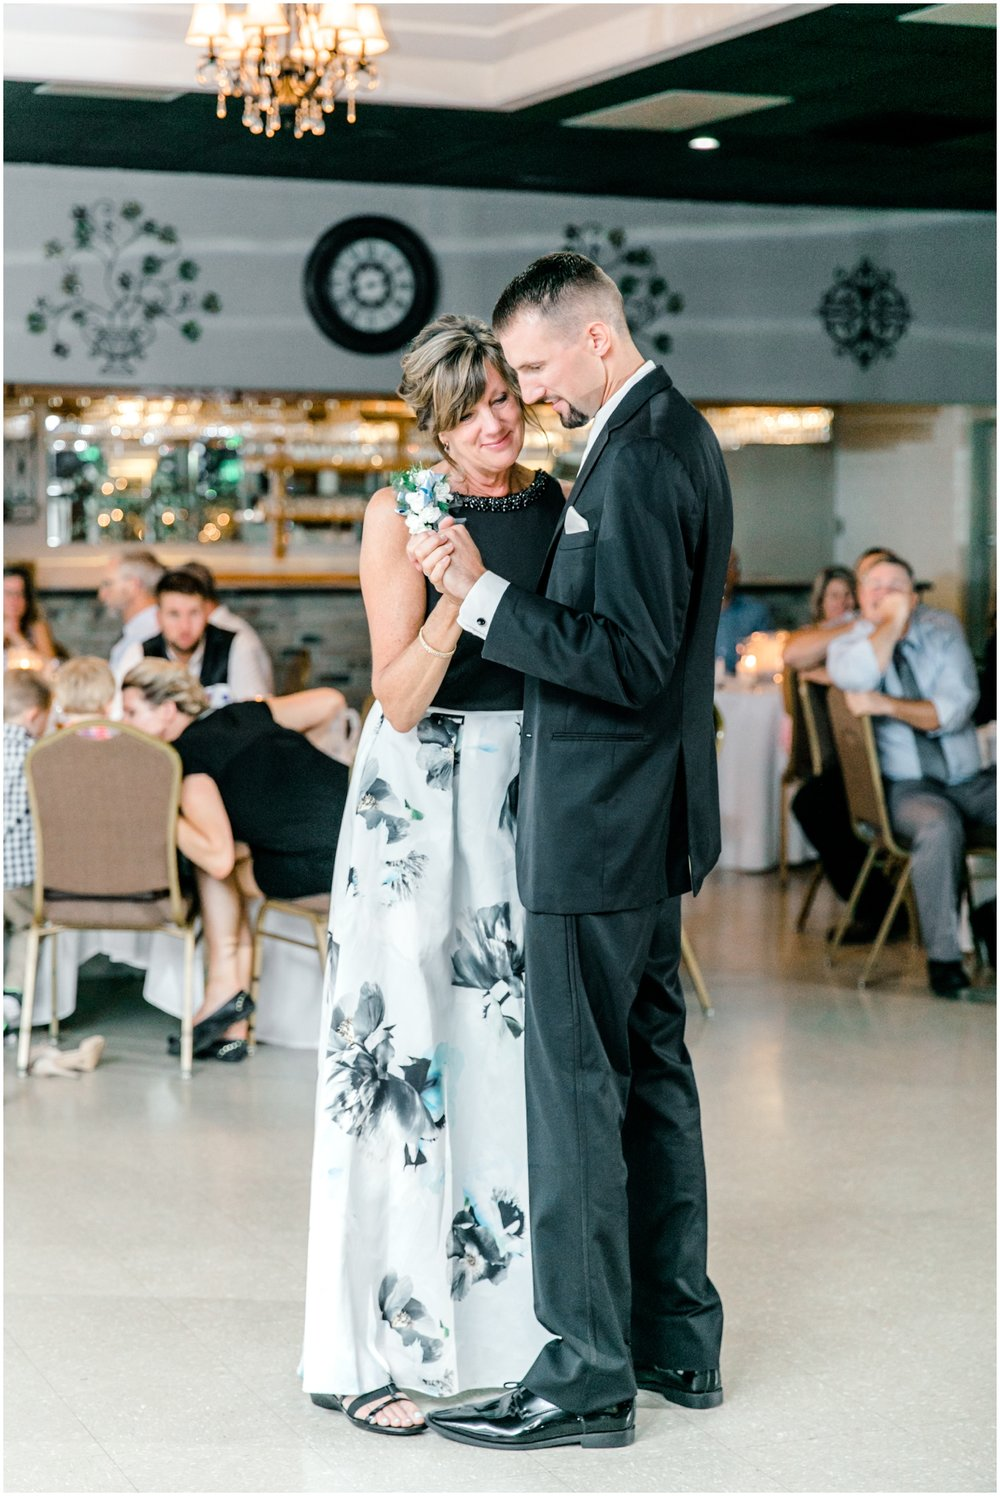 Summer Maryland Wedding - Krista Brackin Photography_0066.jpg